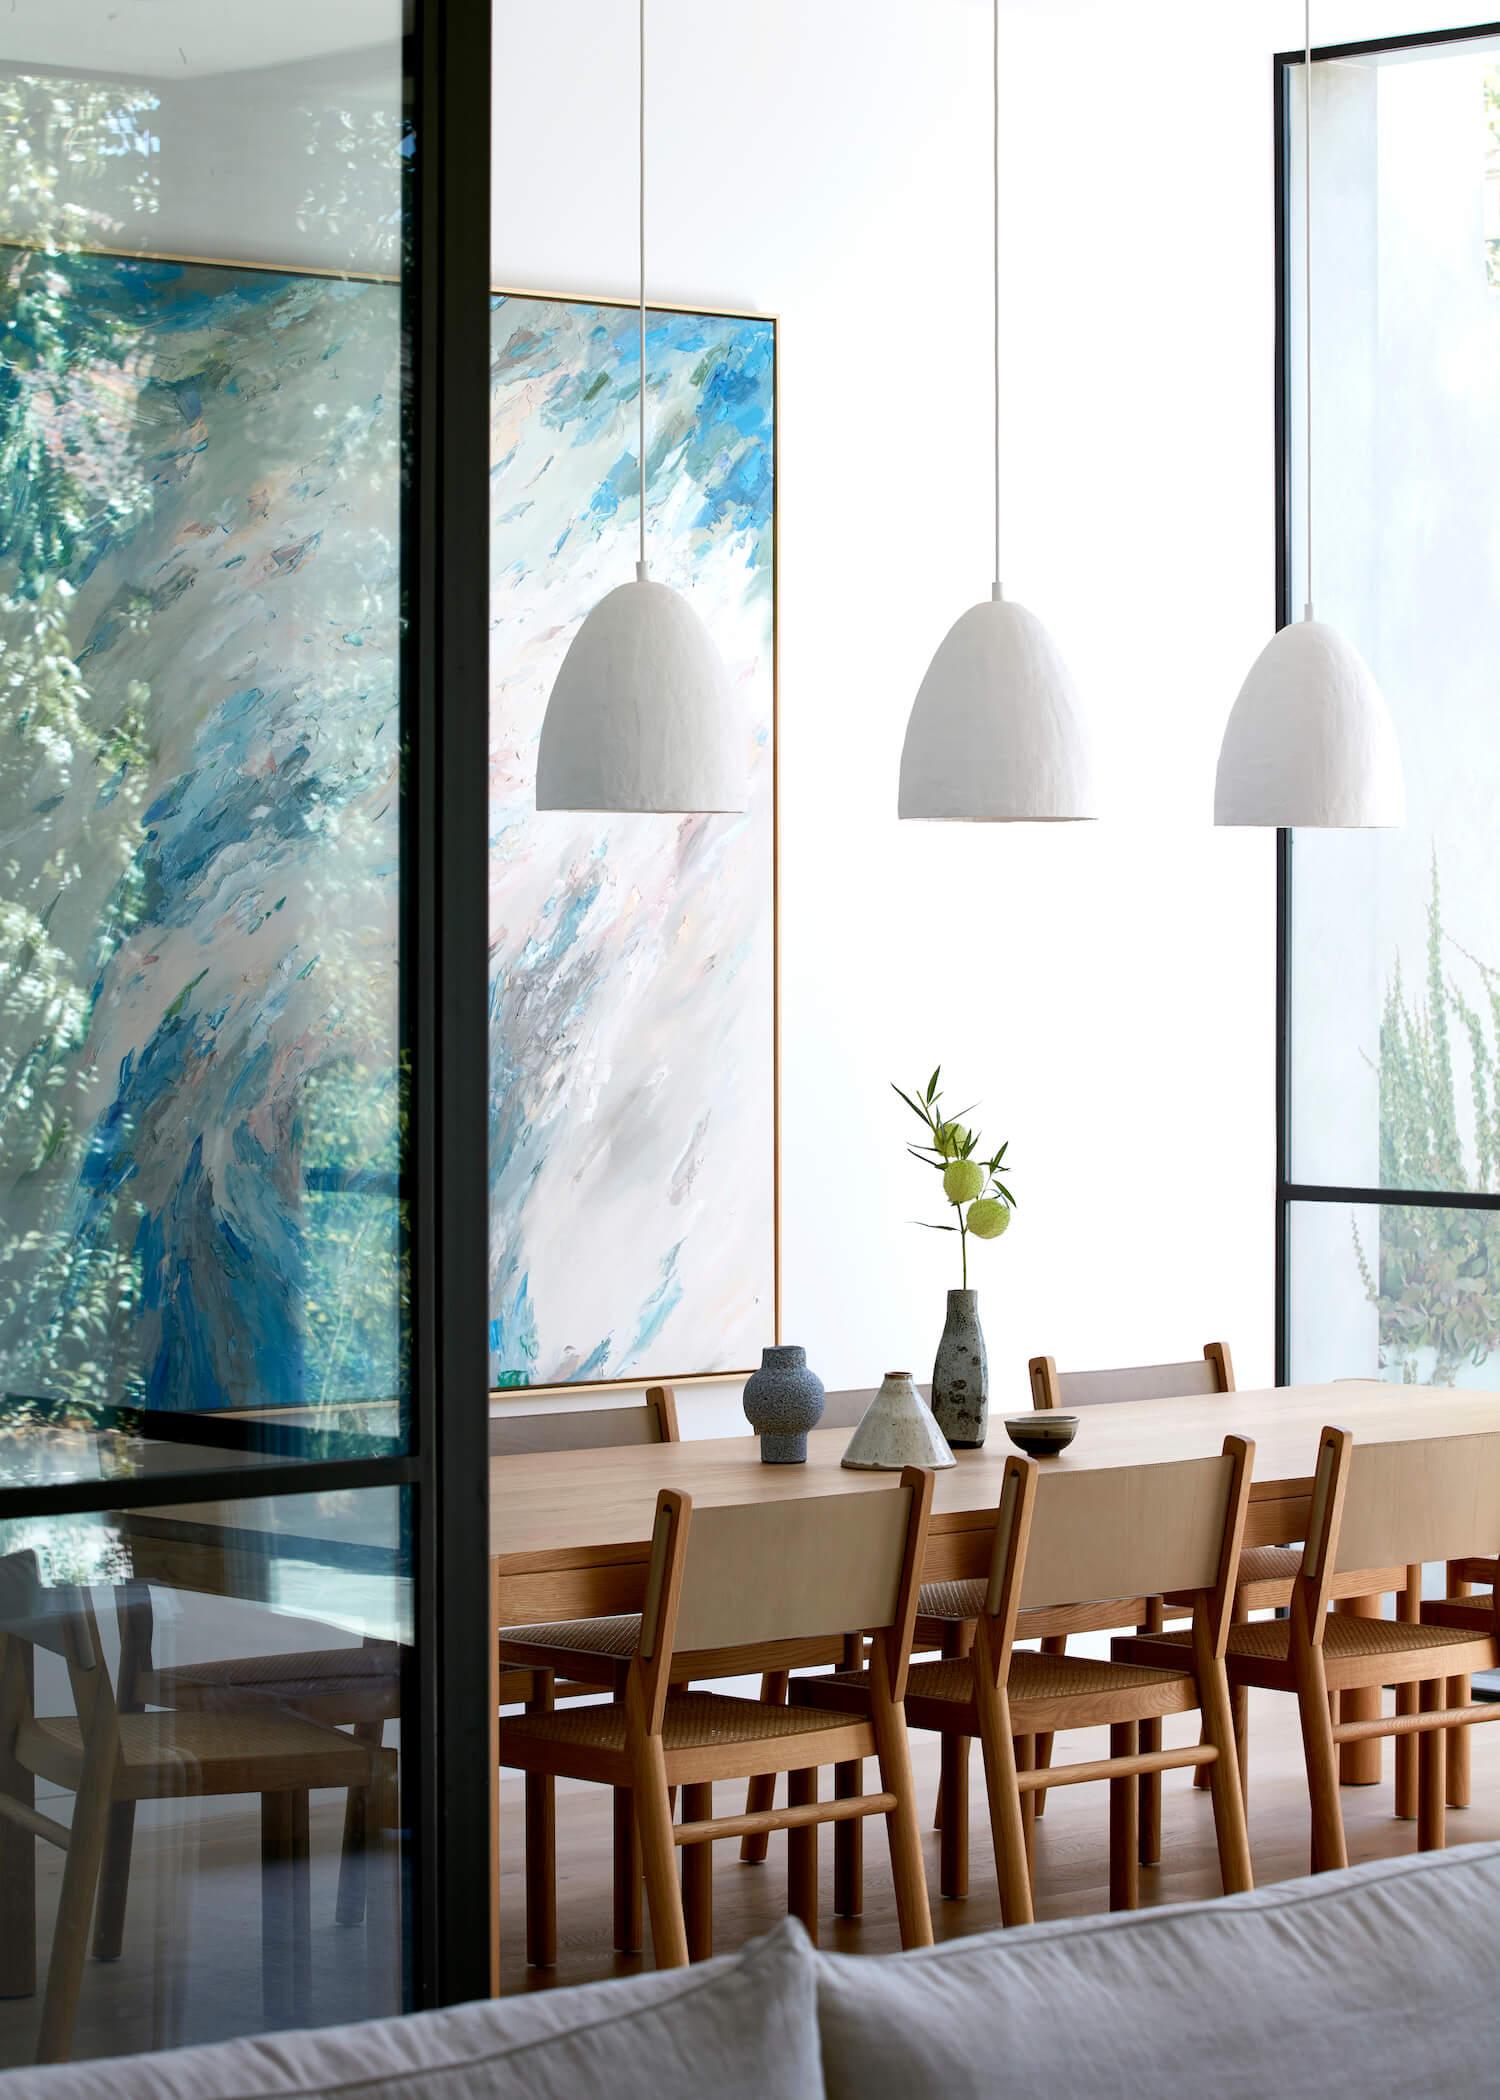 est living inglis architects northcote house 11